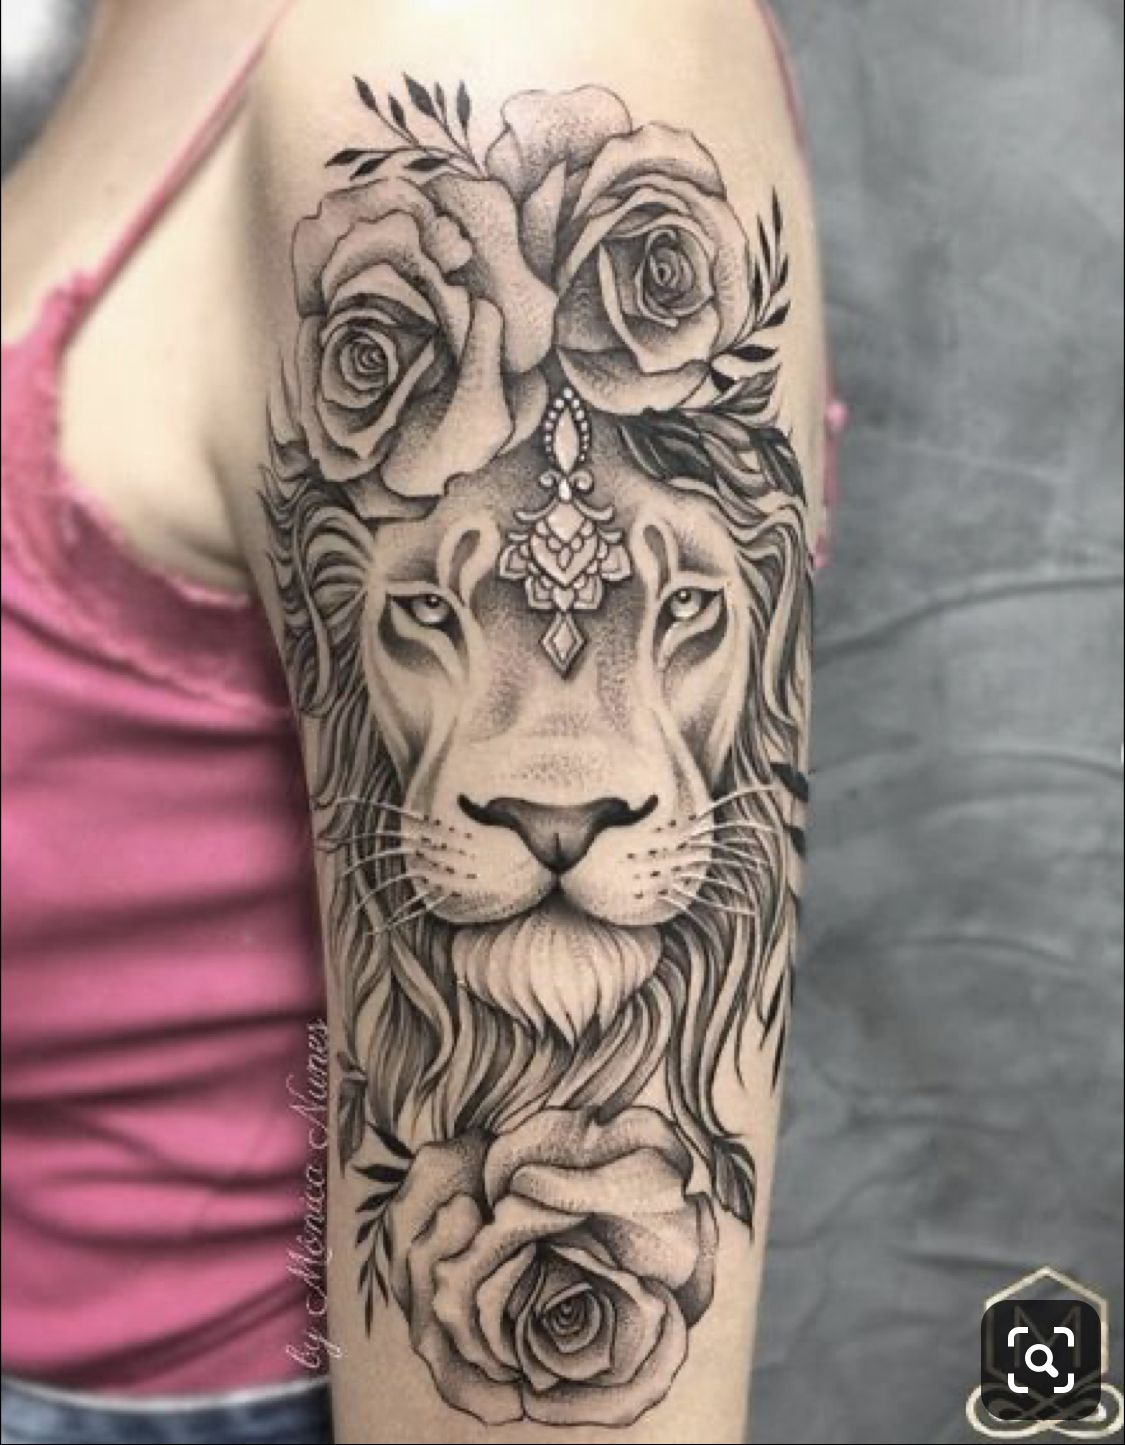 Pin By Ashley Lineberry On Tatuagem Lion Tattoo Sleeves Half Sleeve Tattoos Designs Tattoos For Women Half Sleeve